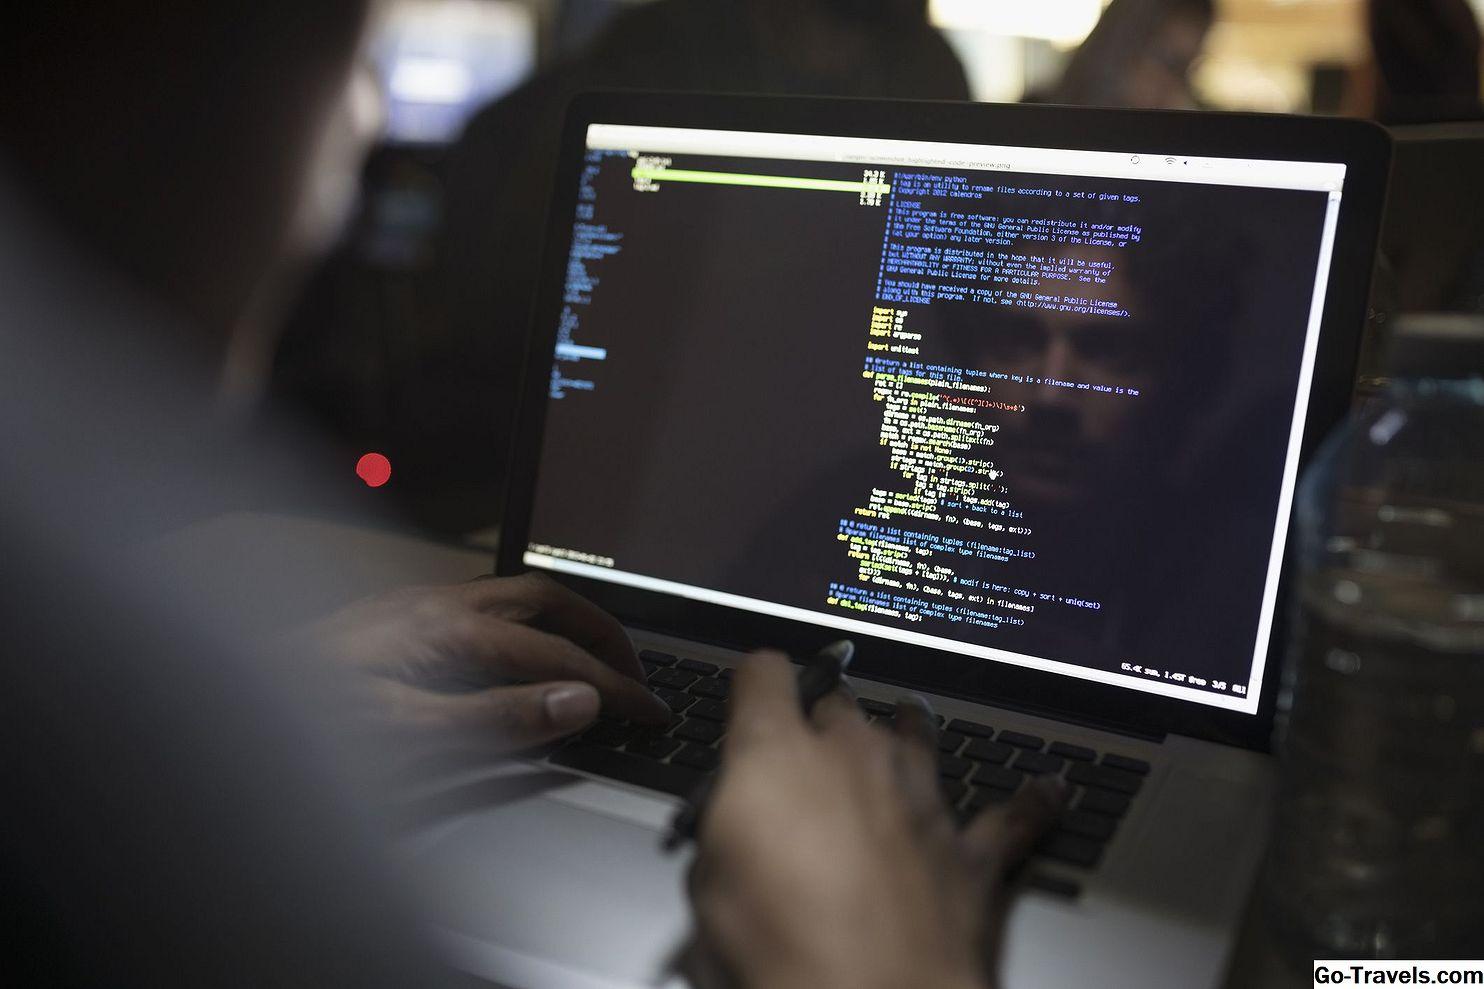 Cum sa eliminati un troian, un virus, un vierme sau alt program malware - Blog - topvacanta.ro